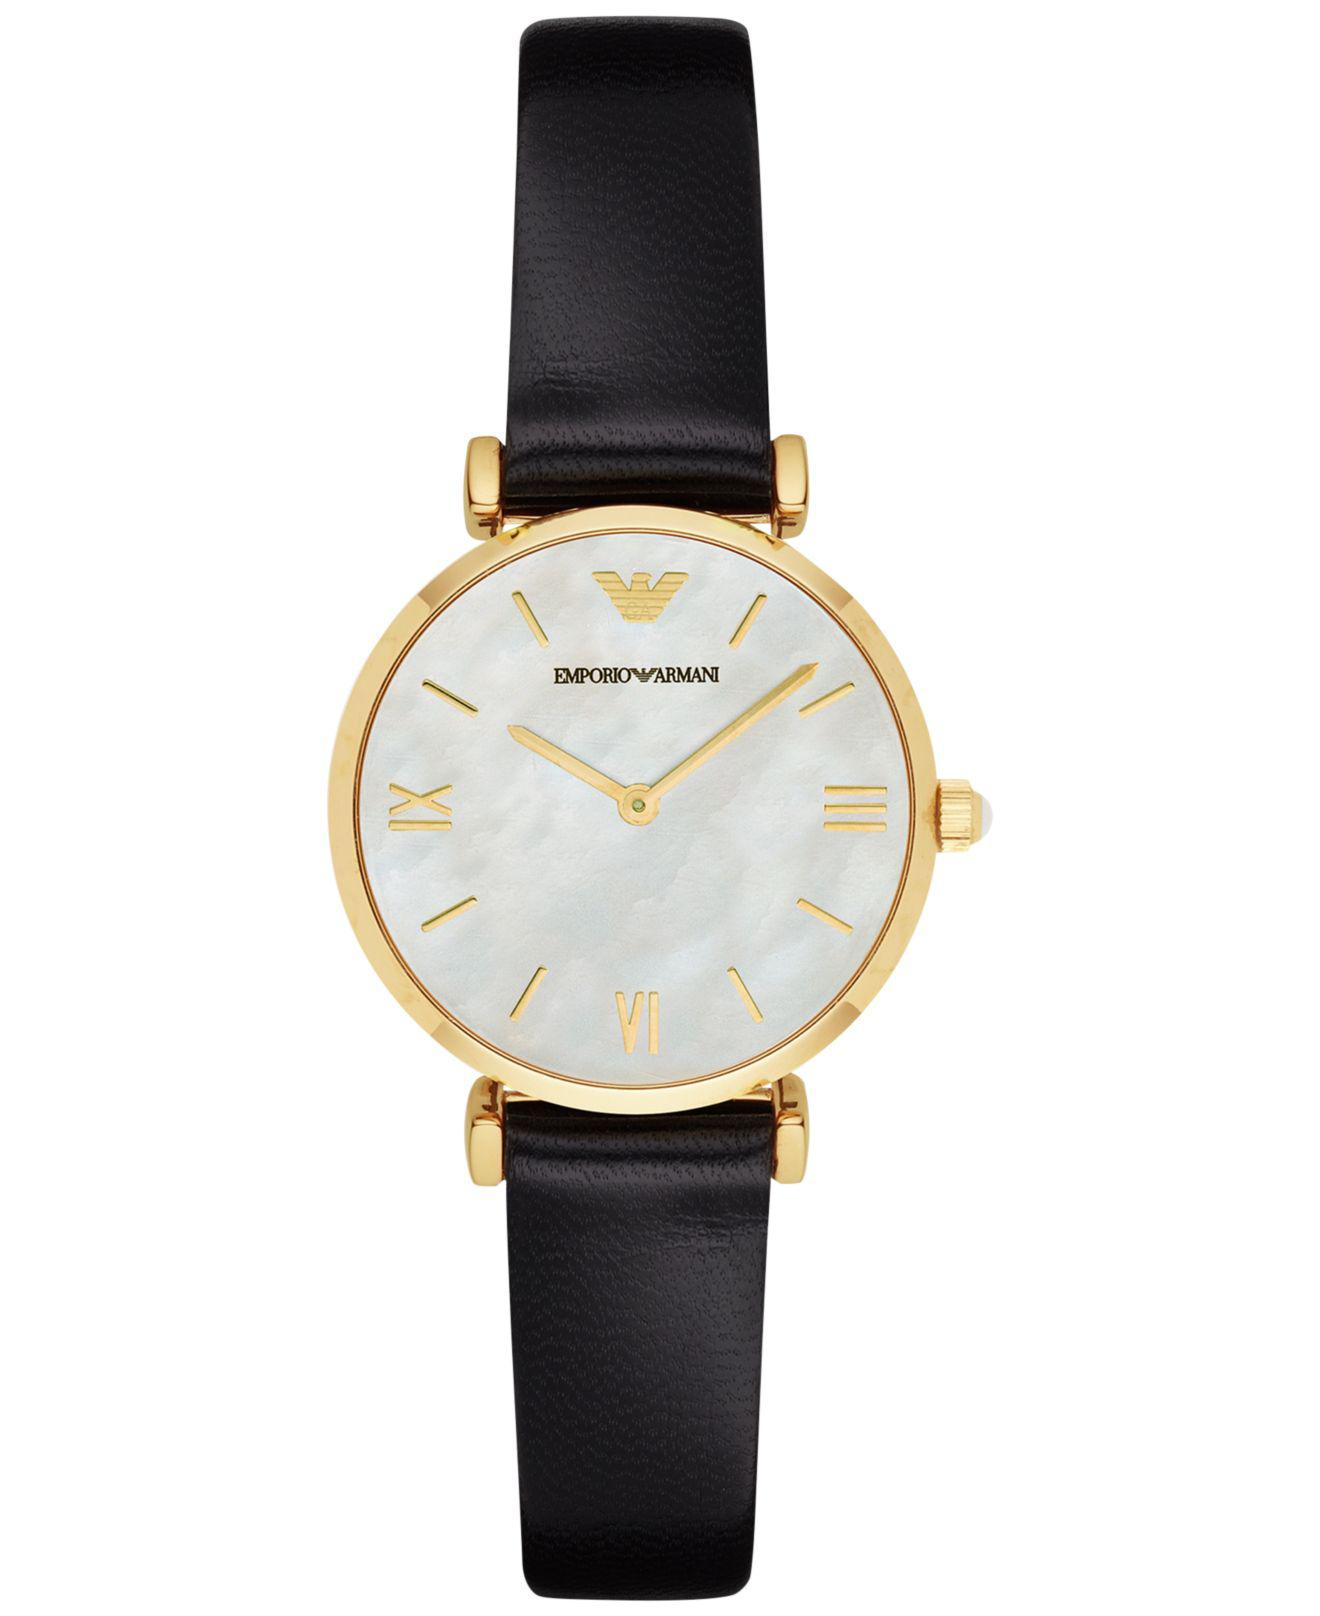 3c9ee70e98b804 Emporio Armani Women's Gianni T-bar Black Leather Strap Watch 32mm ...